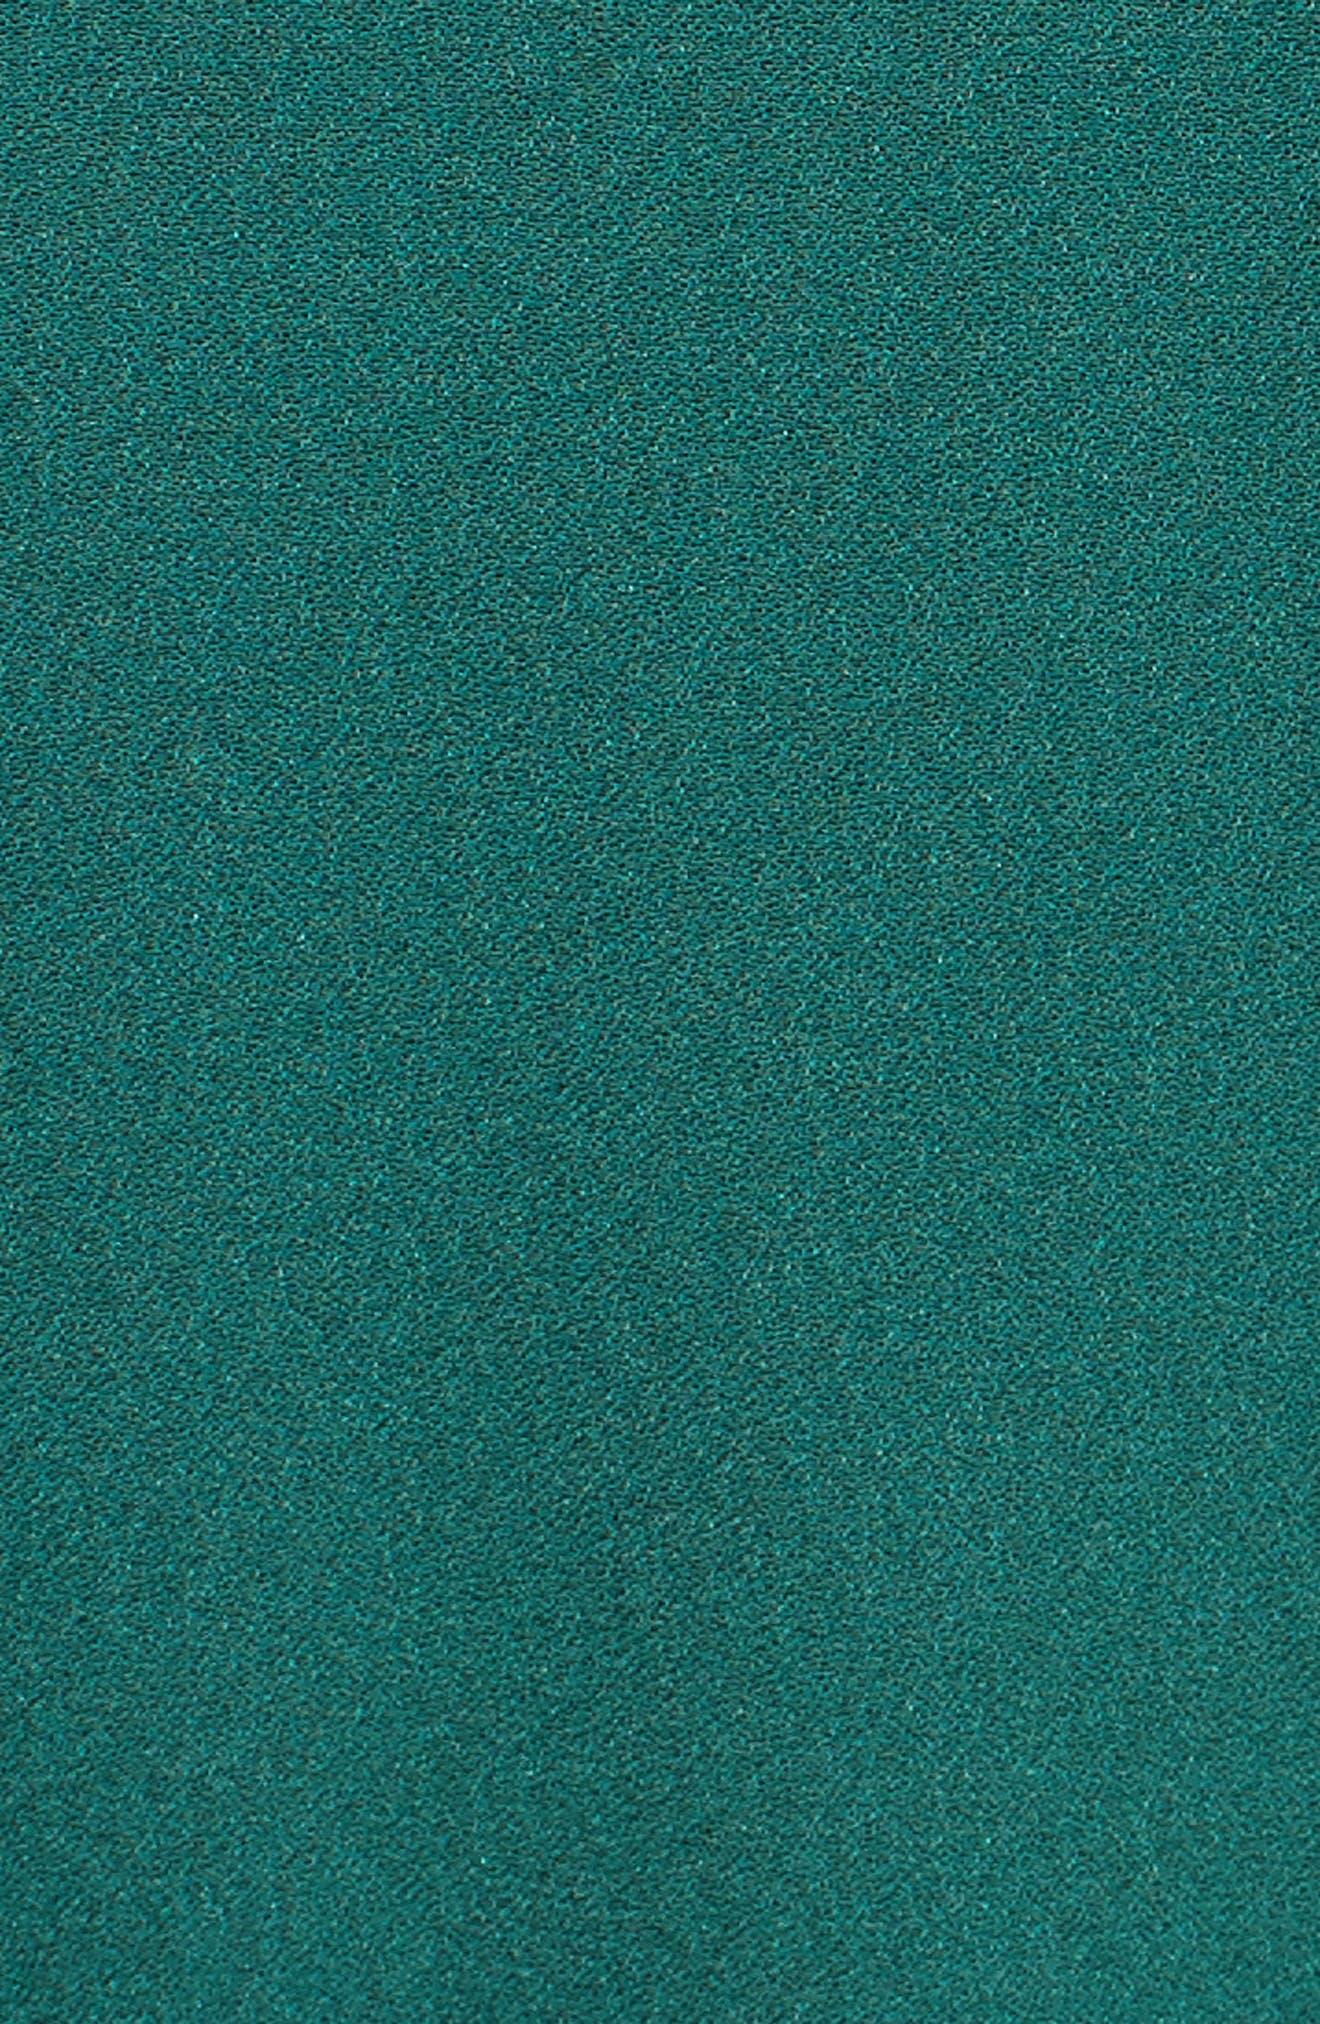 Micah Silk Wrap Dress,                             Alternate thumbnail 5, color,                             301